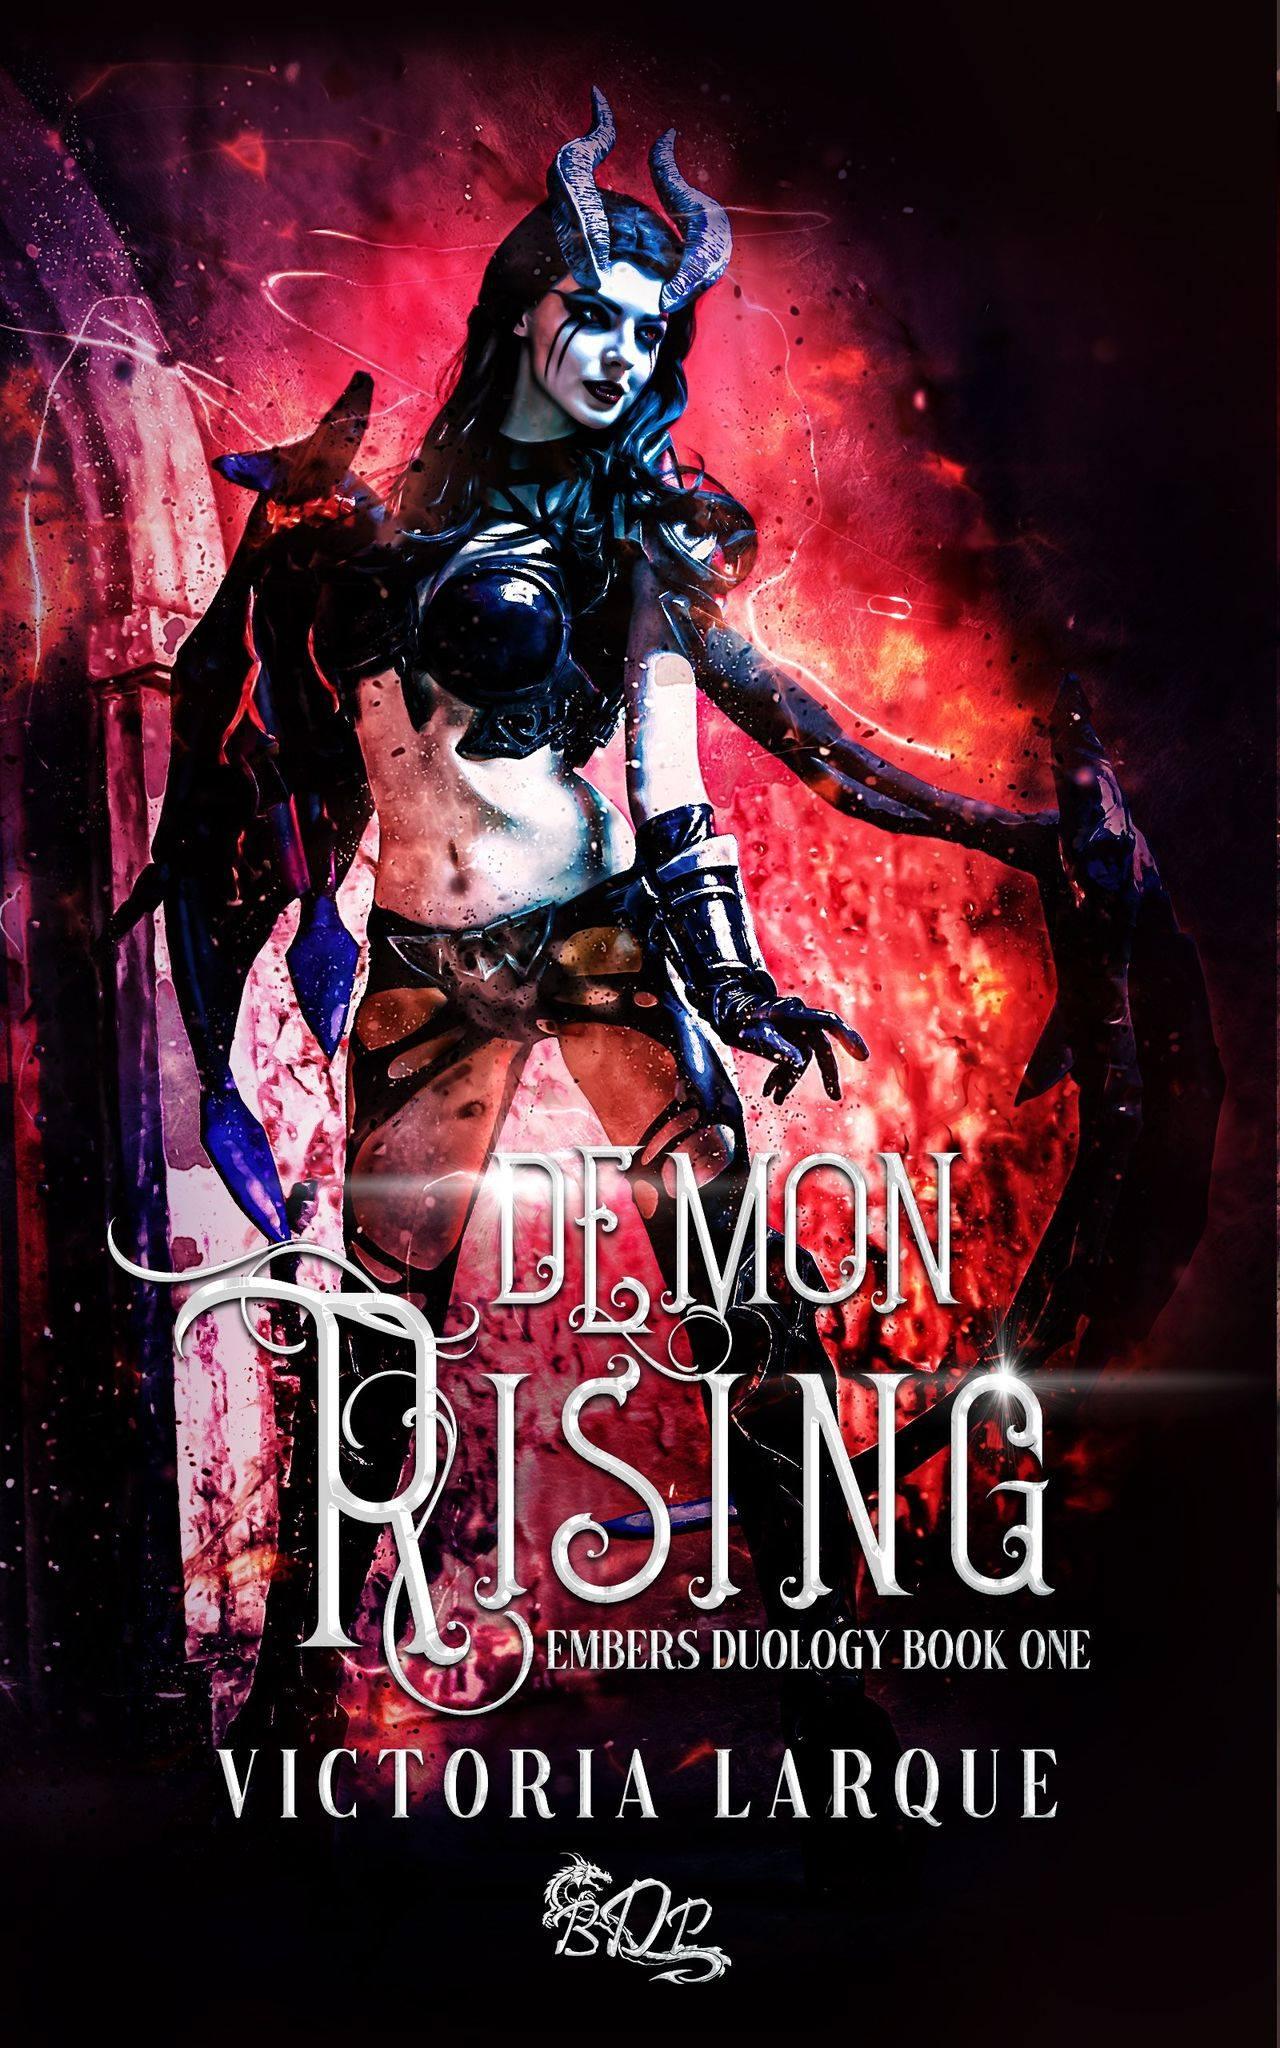 Embers Duology Book One - Demon Rising